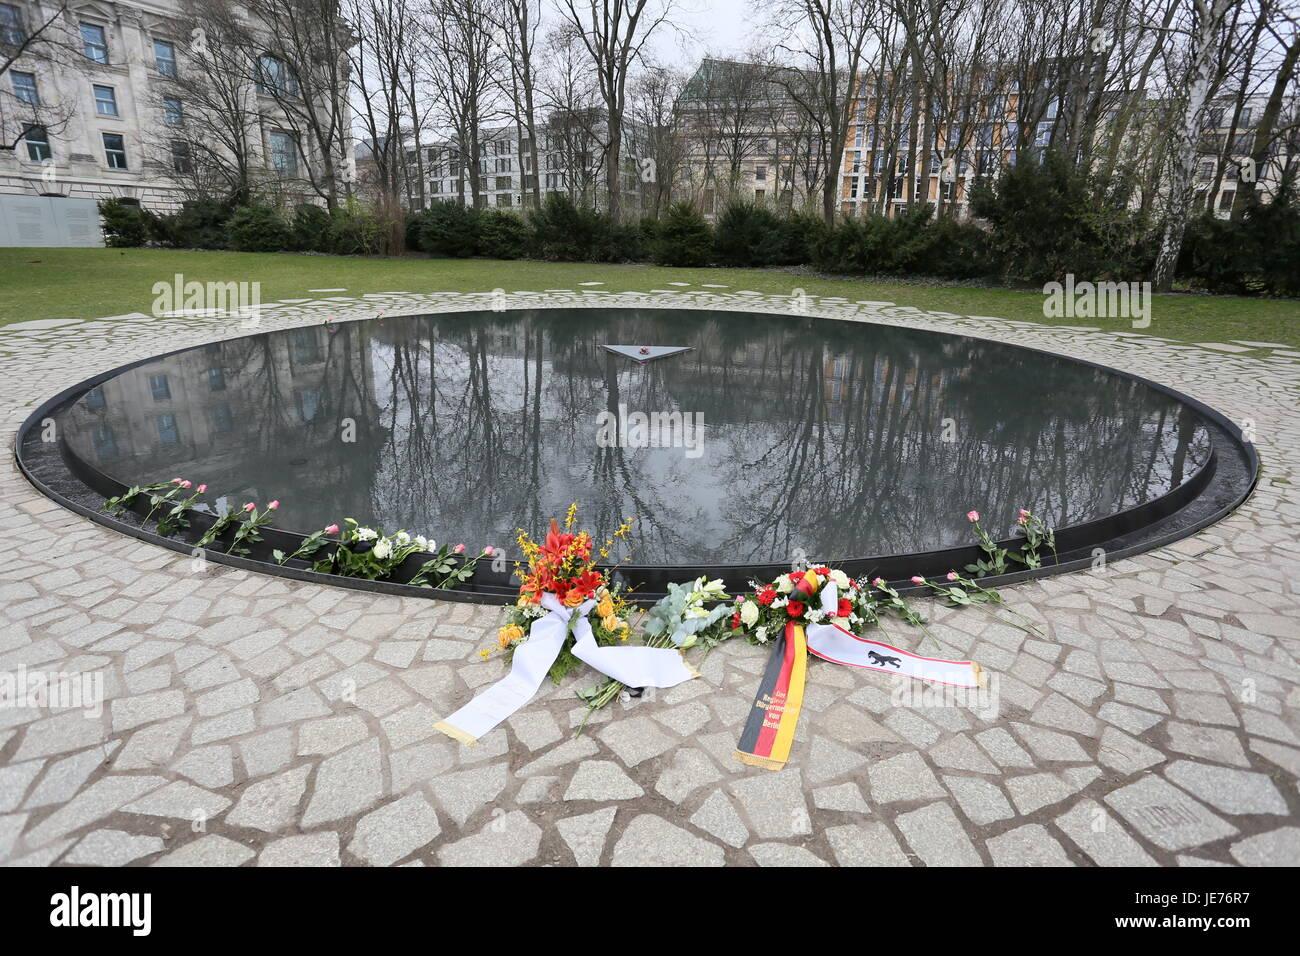 Berlin, Germany, April 8th, 2015: Rally on International Roma Day at Brandenburg Gate. - Stock Image